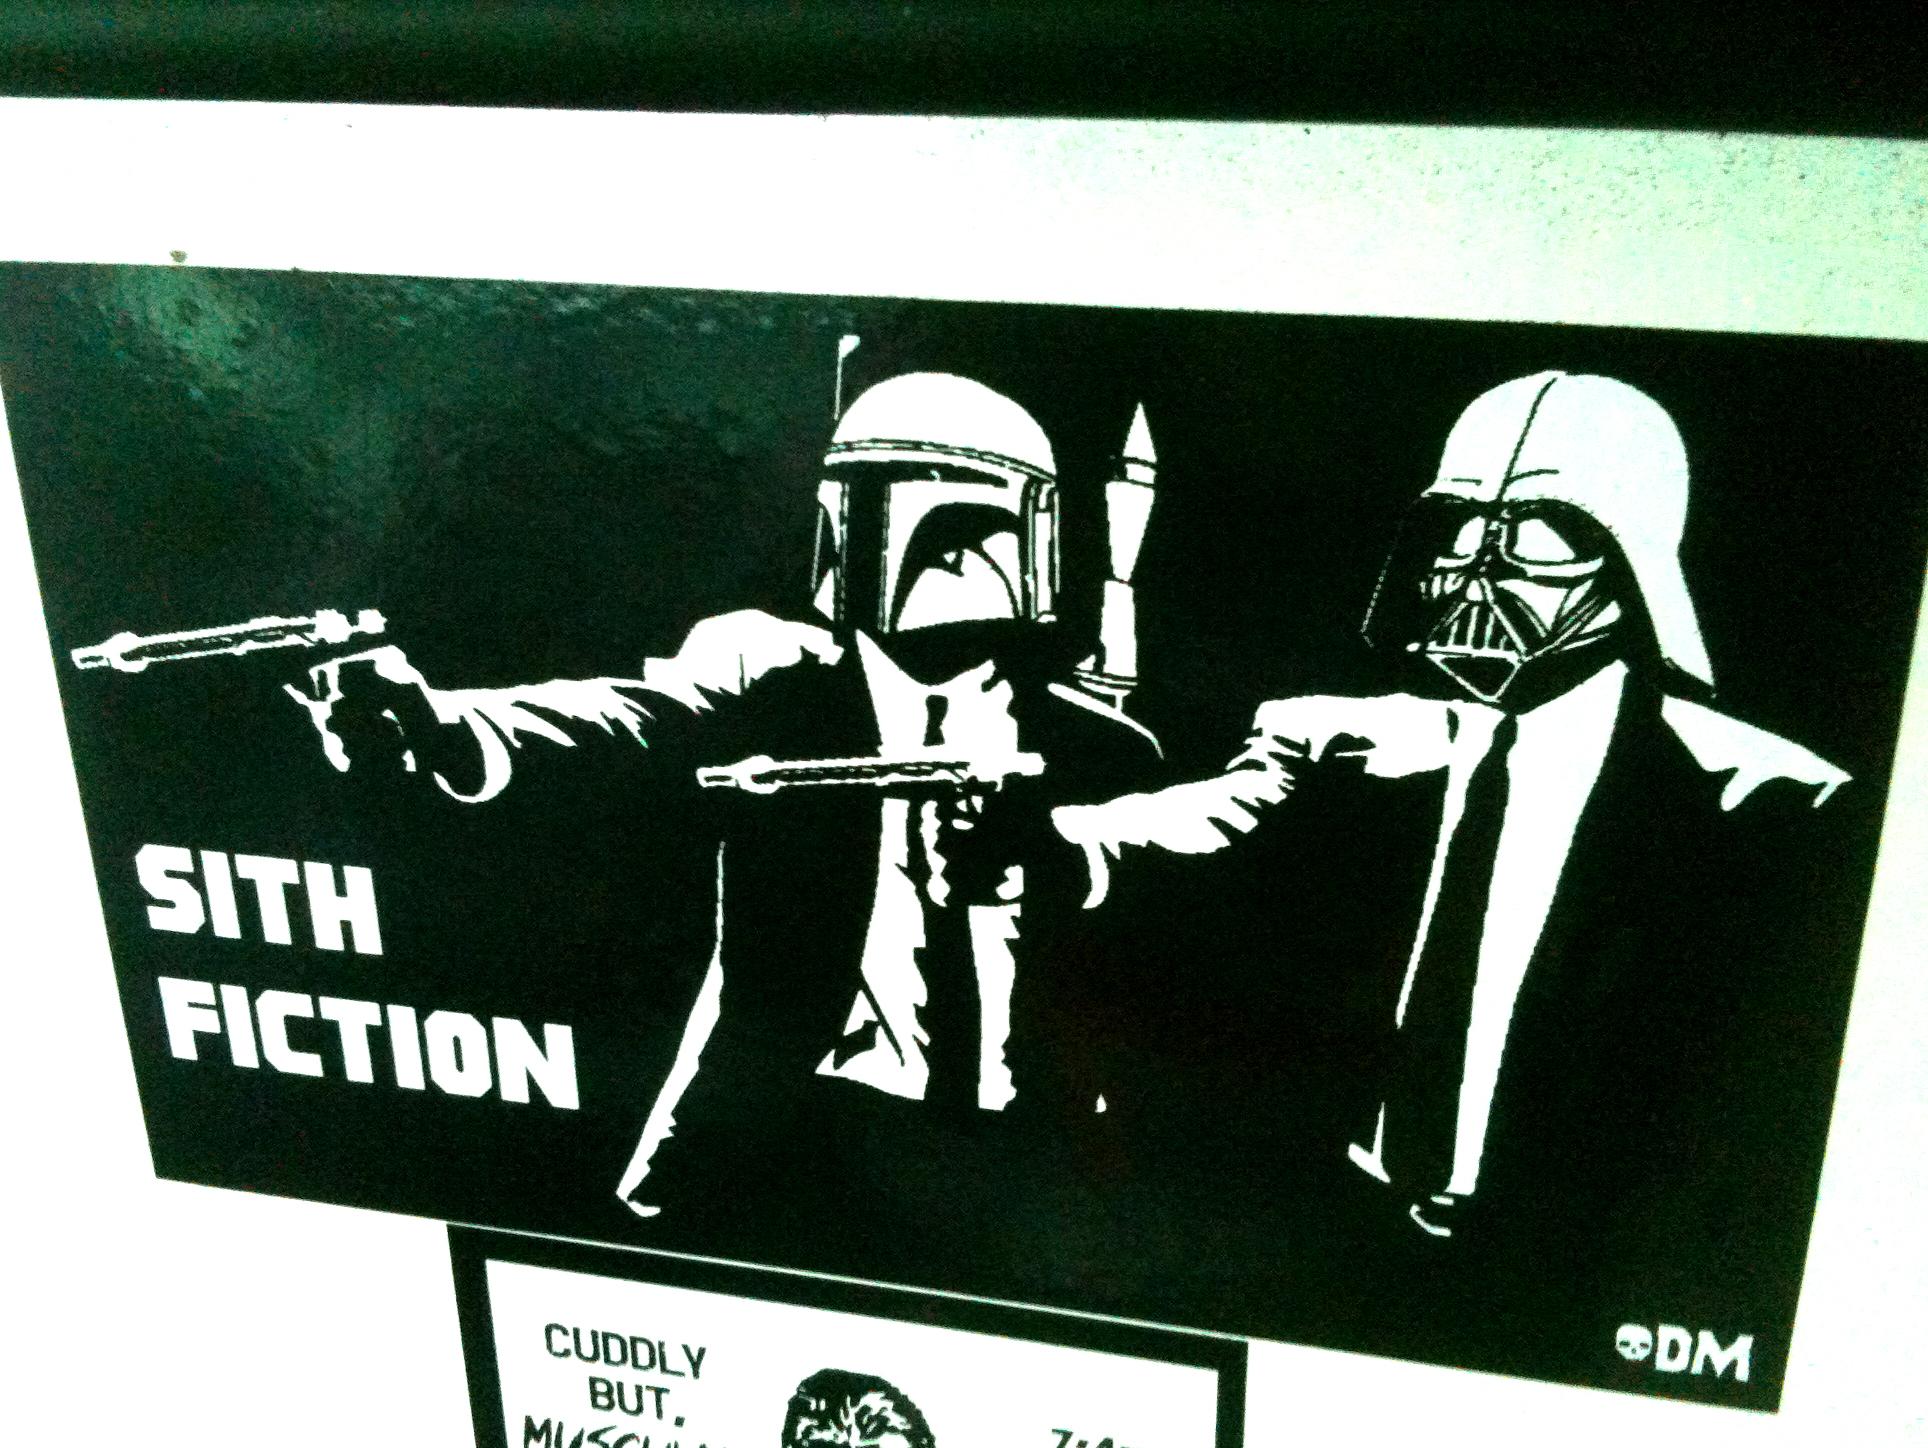 Sith Fiction Star Wars Pulp Fiction Mashup Vinyl Sticker